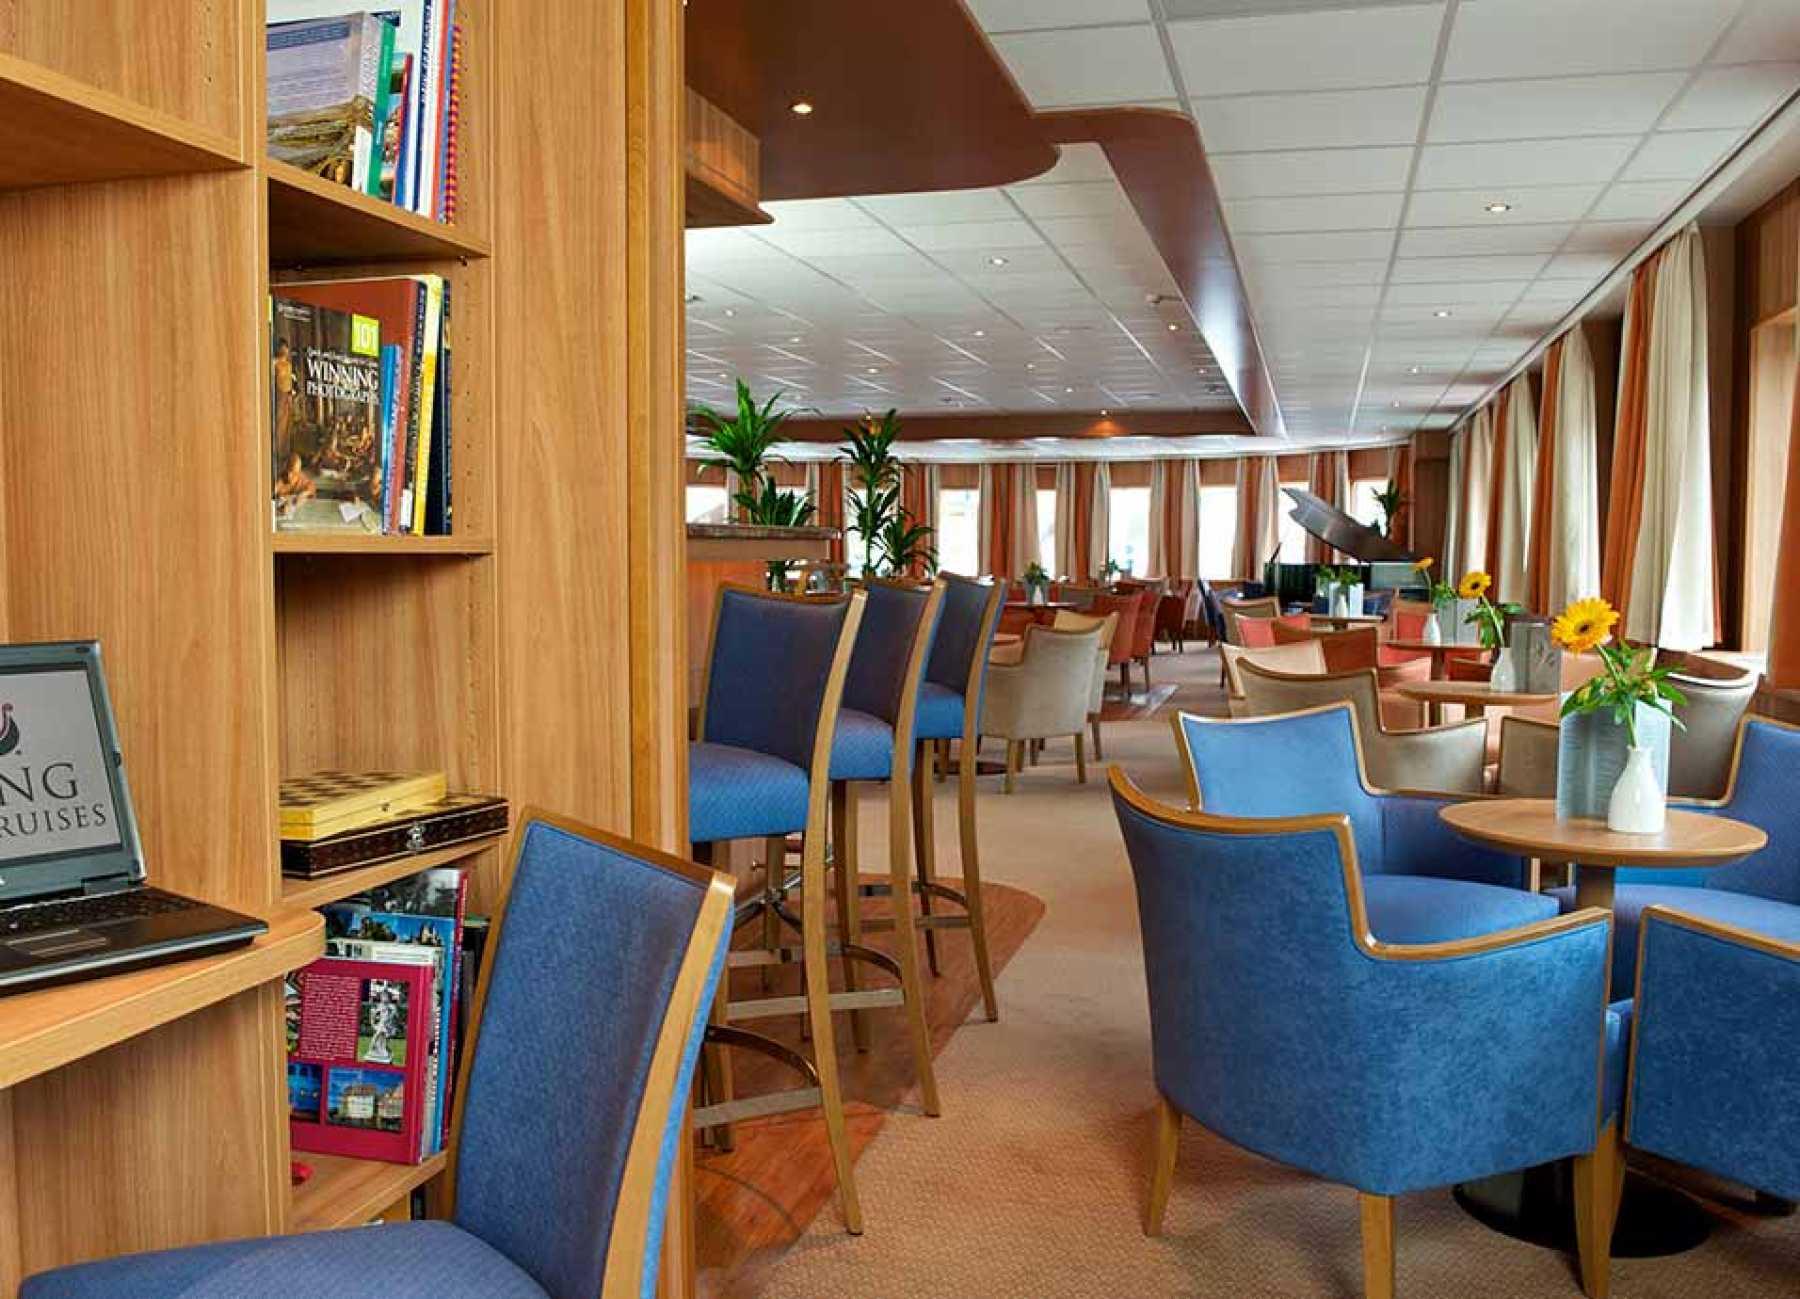 Viking River Cruises Viking Fontane Viking Schumann Interior Library.jpg